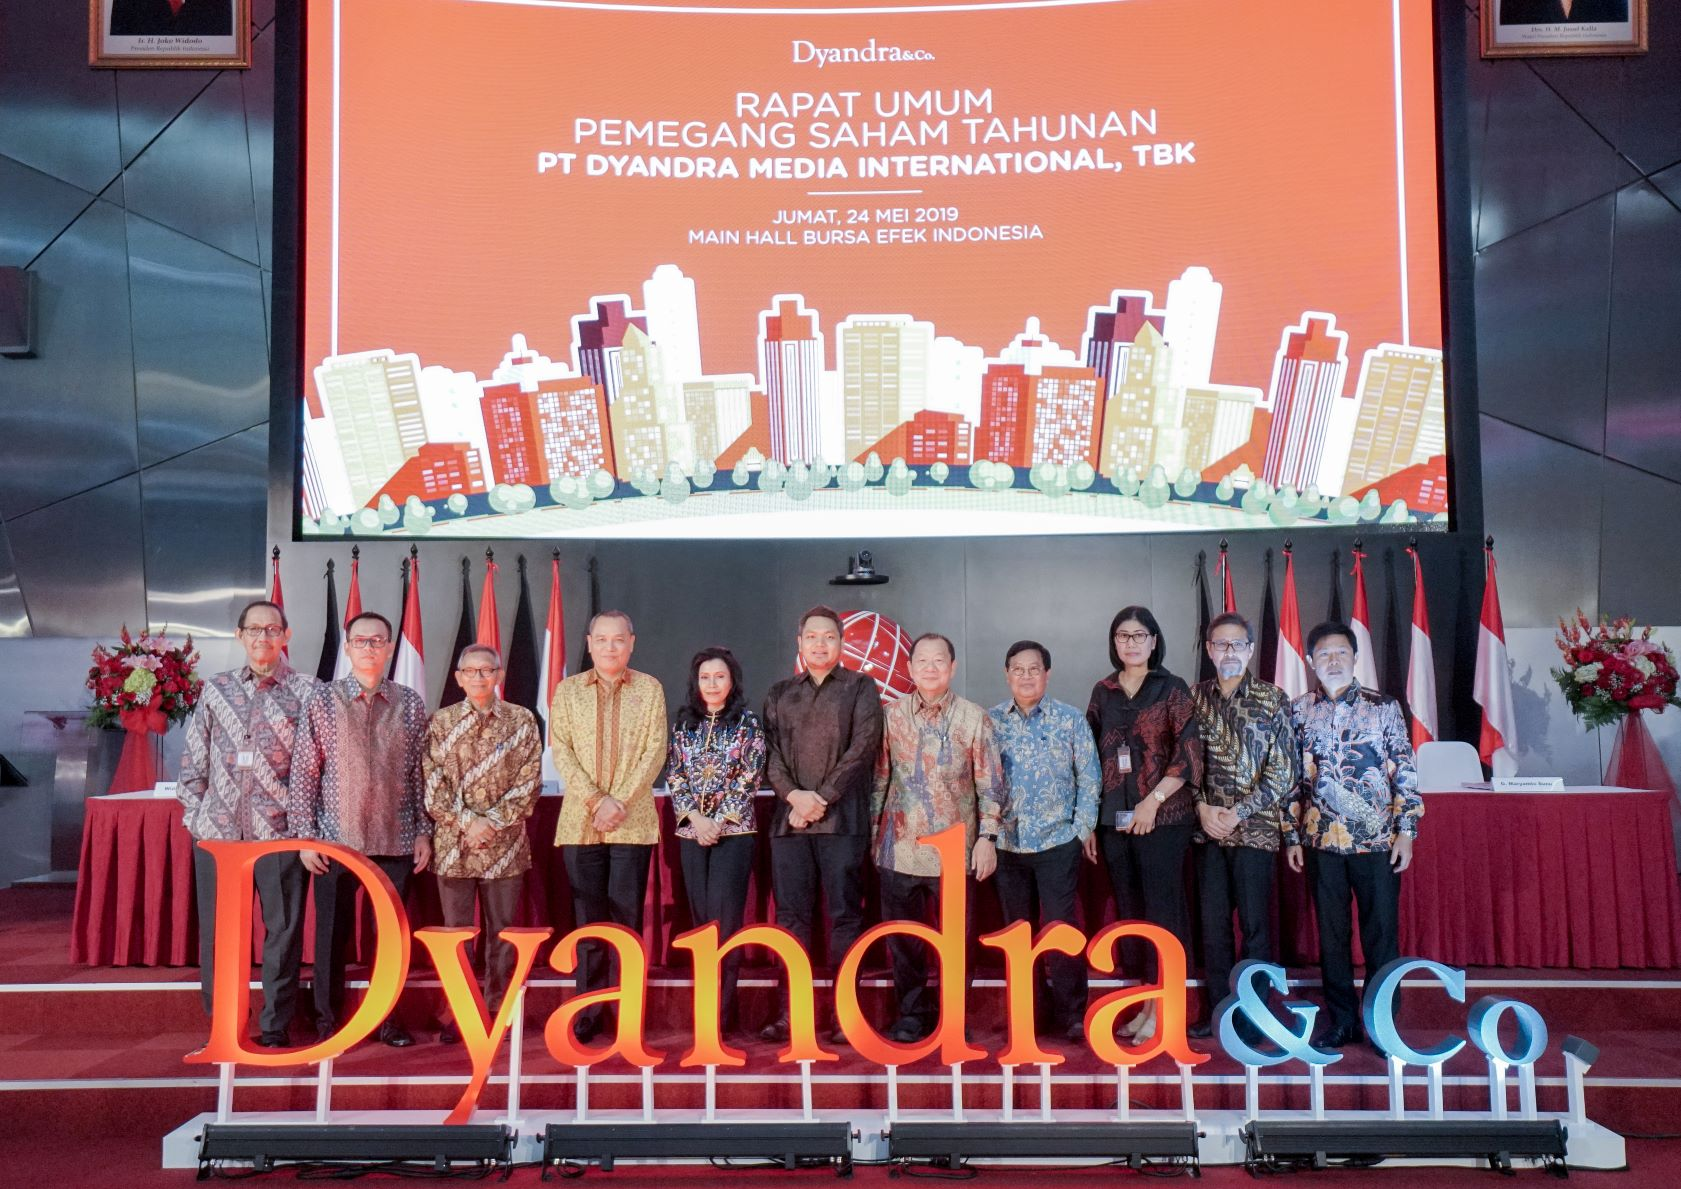 Dyandra Bagi Dividen Rp. 8,5 Miliar